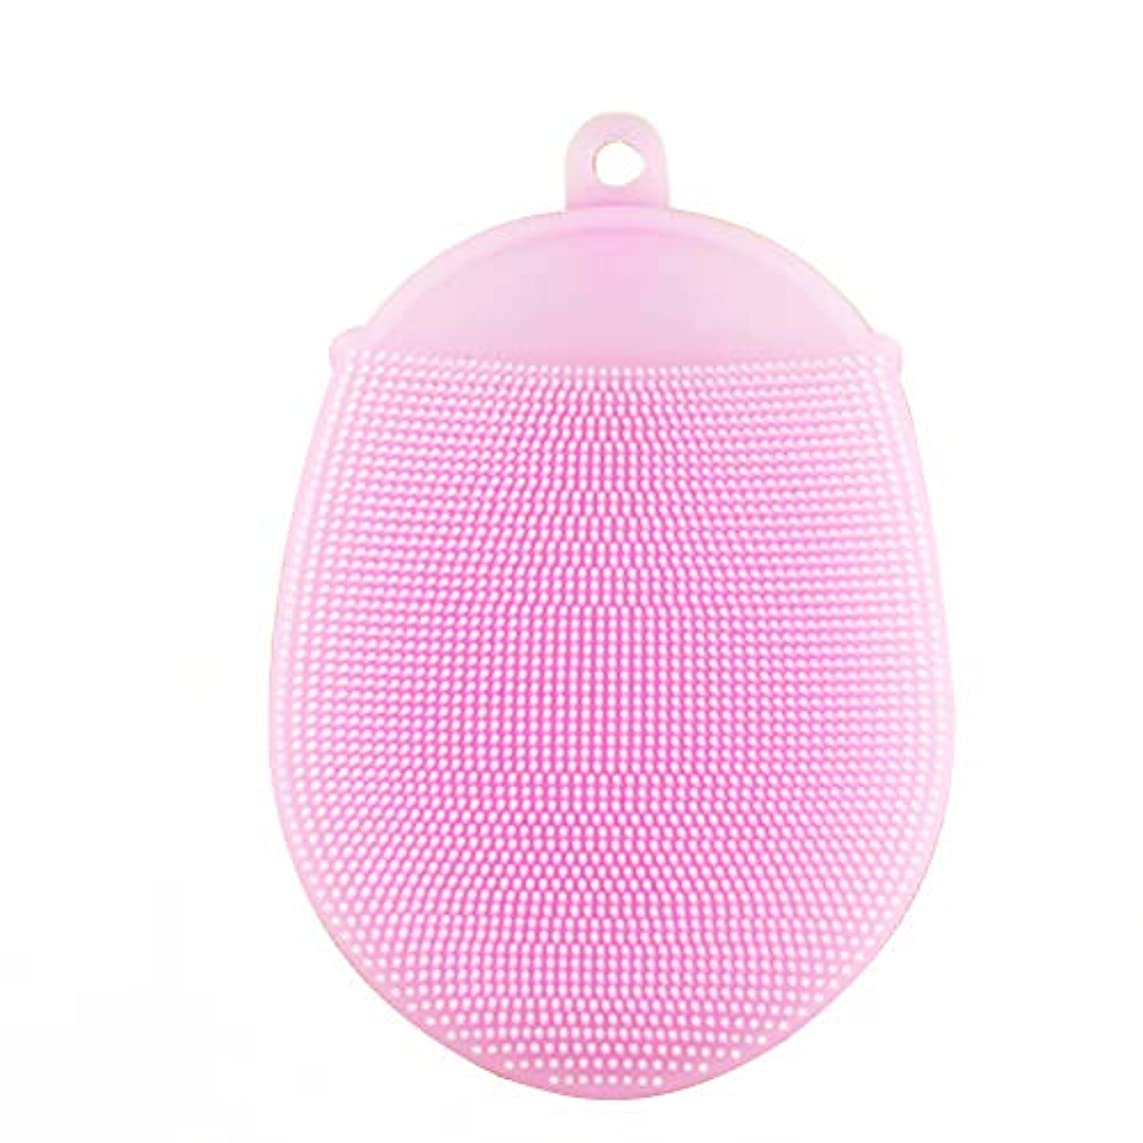 Healifty シリコン 入浴ブラシ 抗菌 シャワースクラバー 洗顔パッド 2本入 (ピンク)